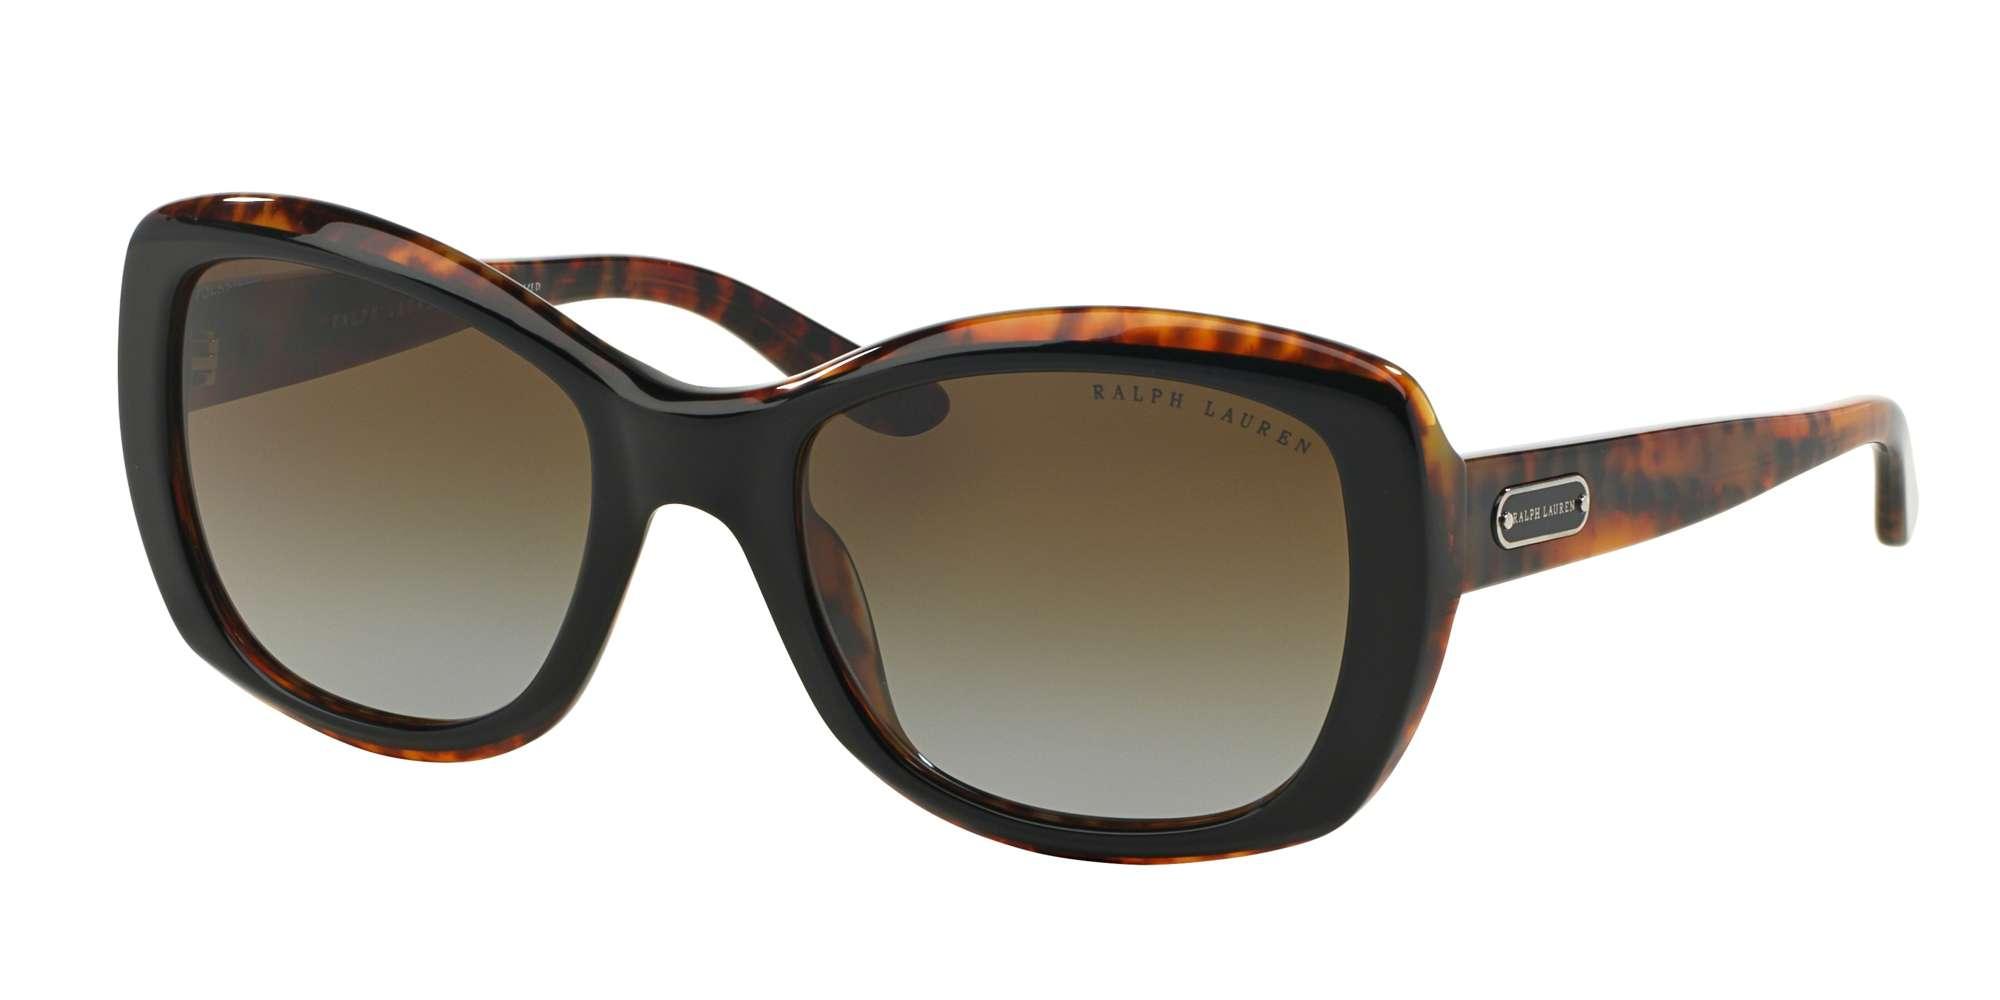 TOP BLACK/HAVANA / POLAR BROWN GRADIENT lenses